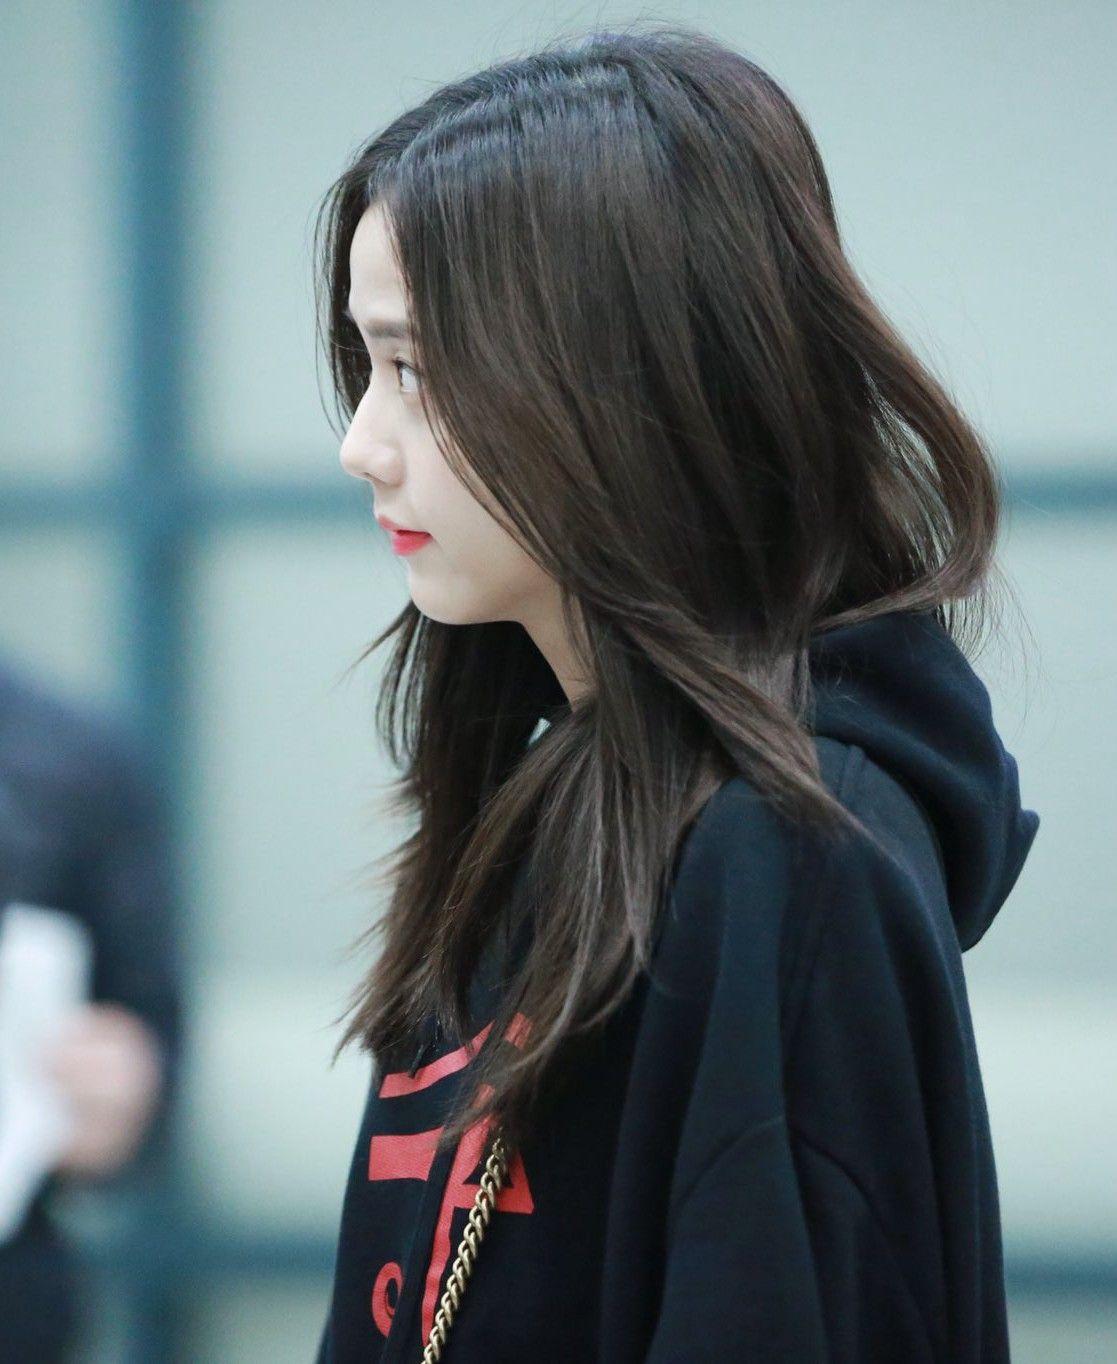 190114 Incheon Airport Jisoo Long Hair Styles Hair Styles Beauty